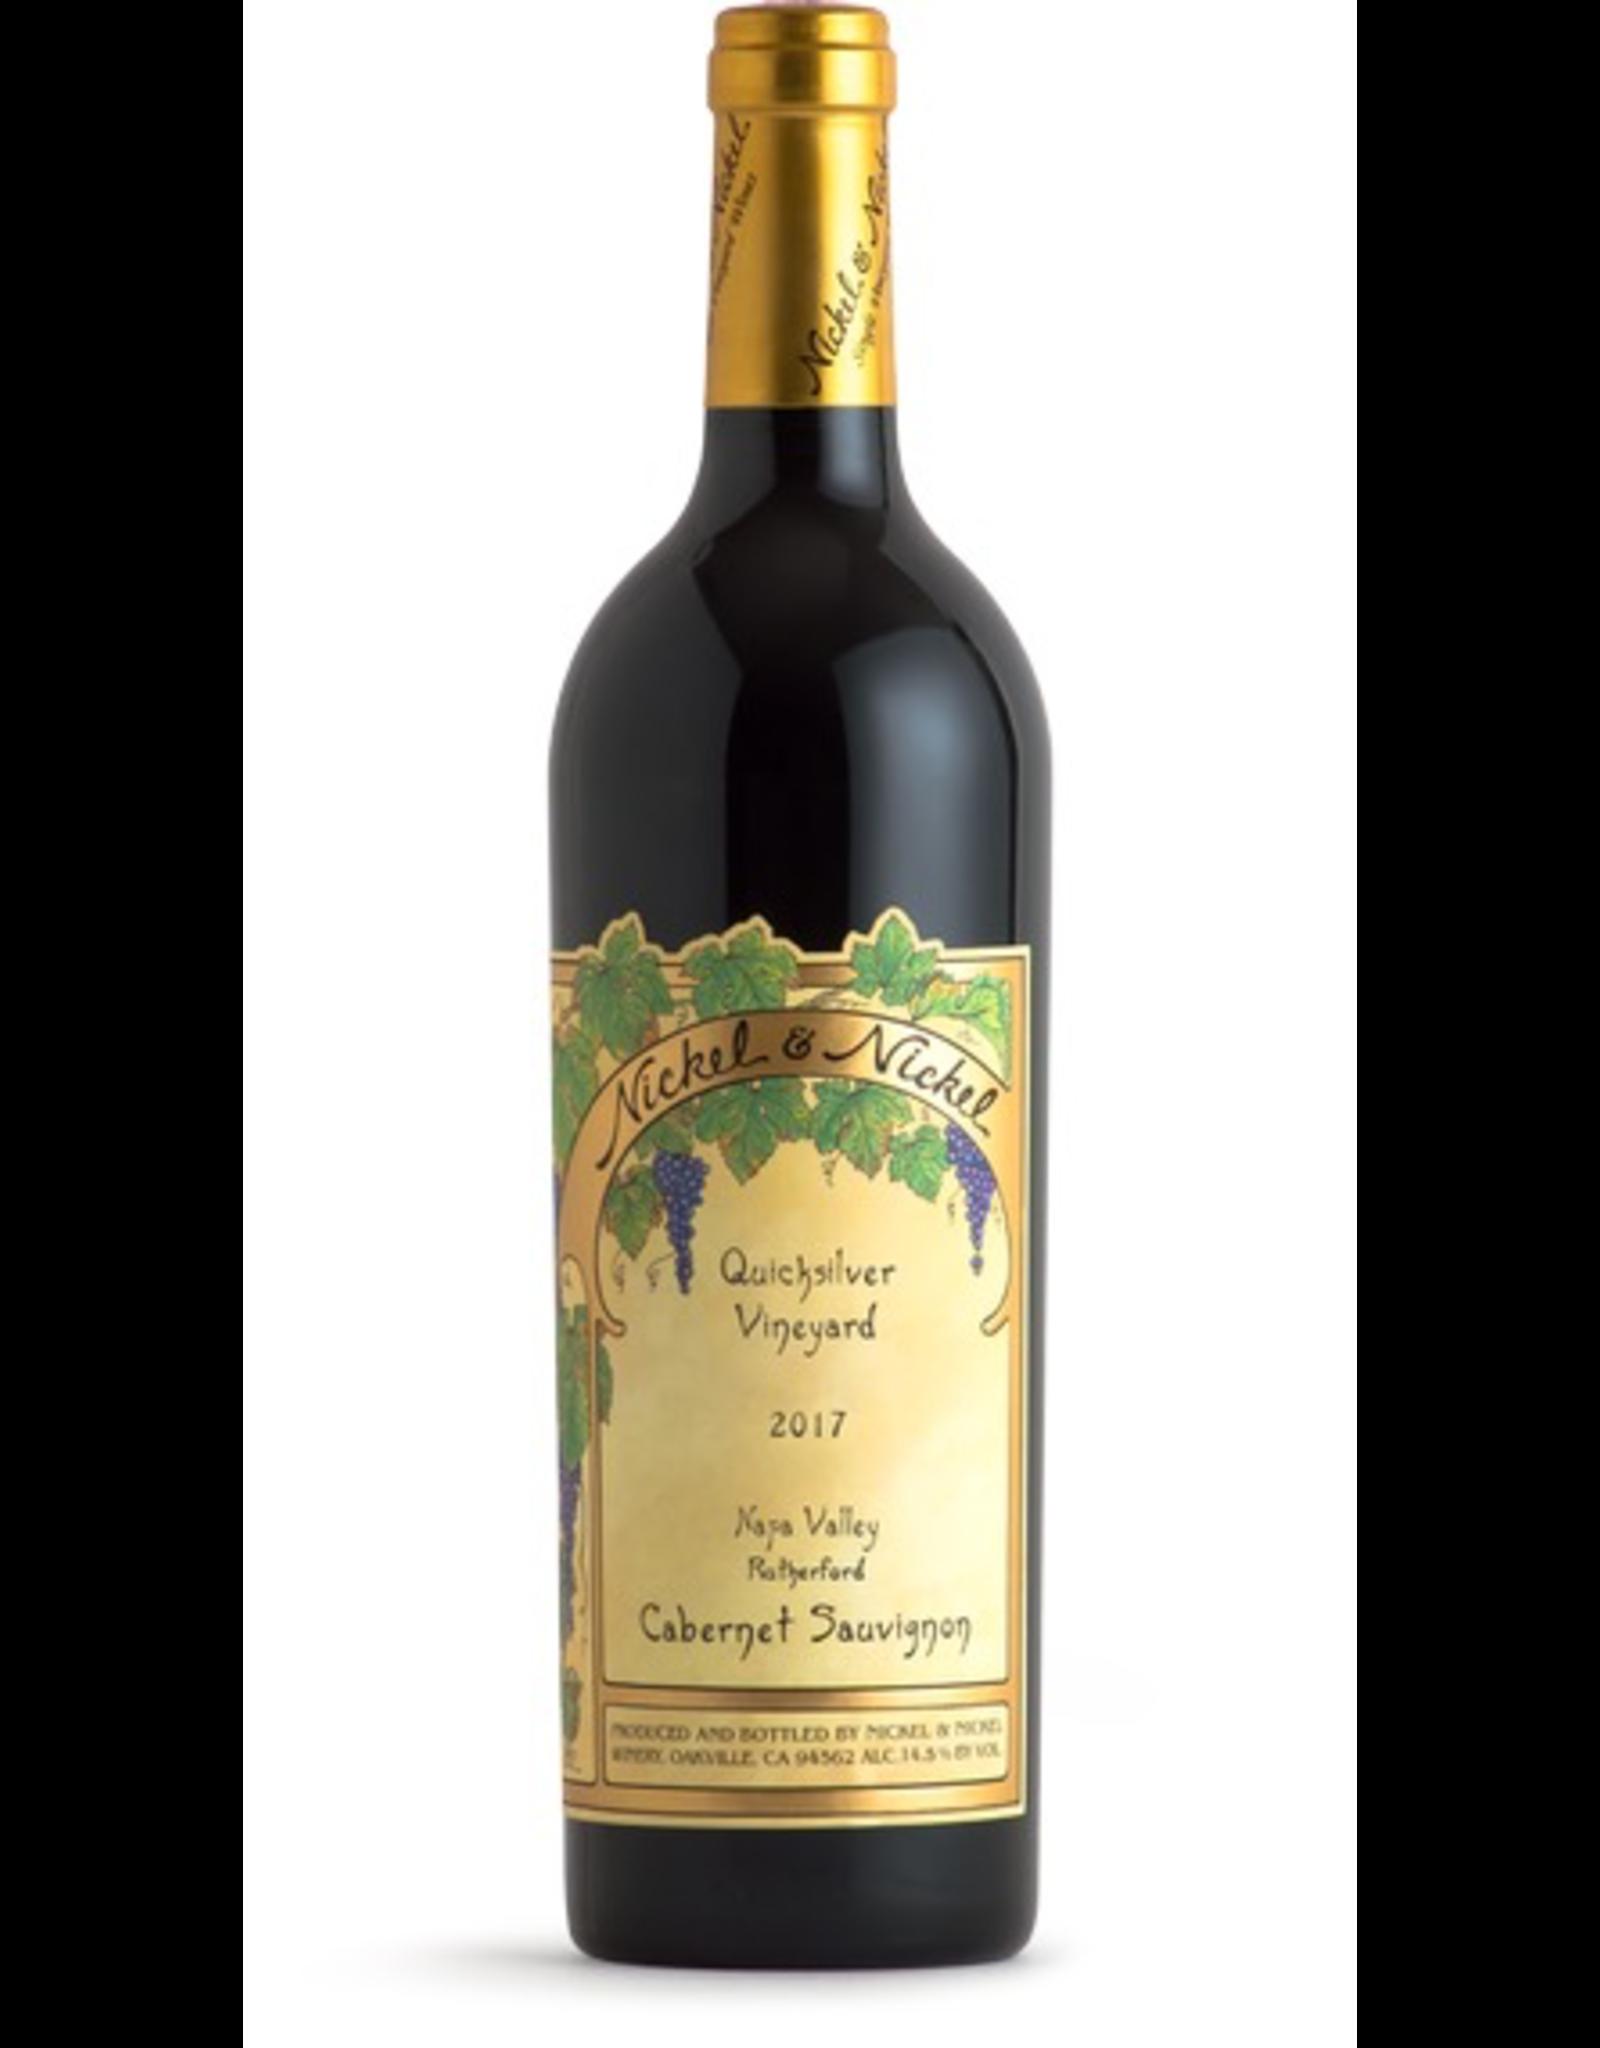 Red Wine 2017, Nickel & Nickel Quicksilver Vineyard, Cabernet Sauvignon, Rutherford, Napa Valley, California, 14.6%, CT88